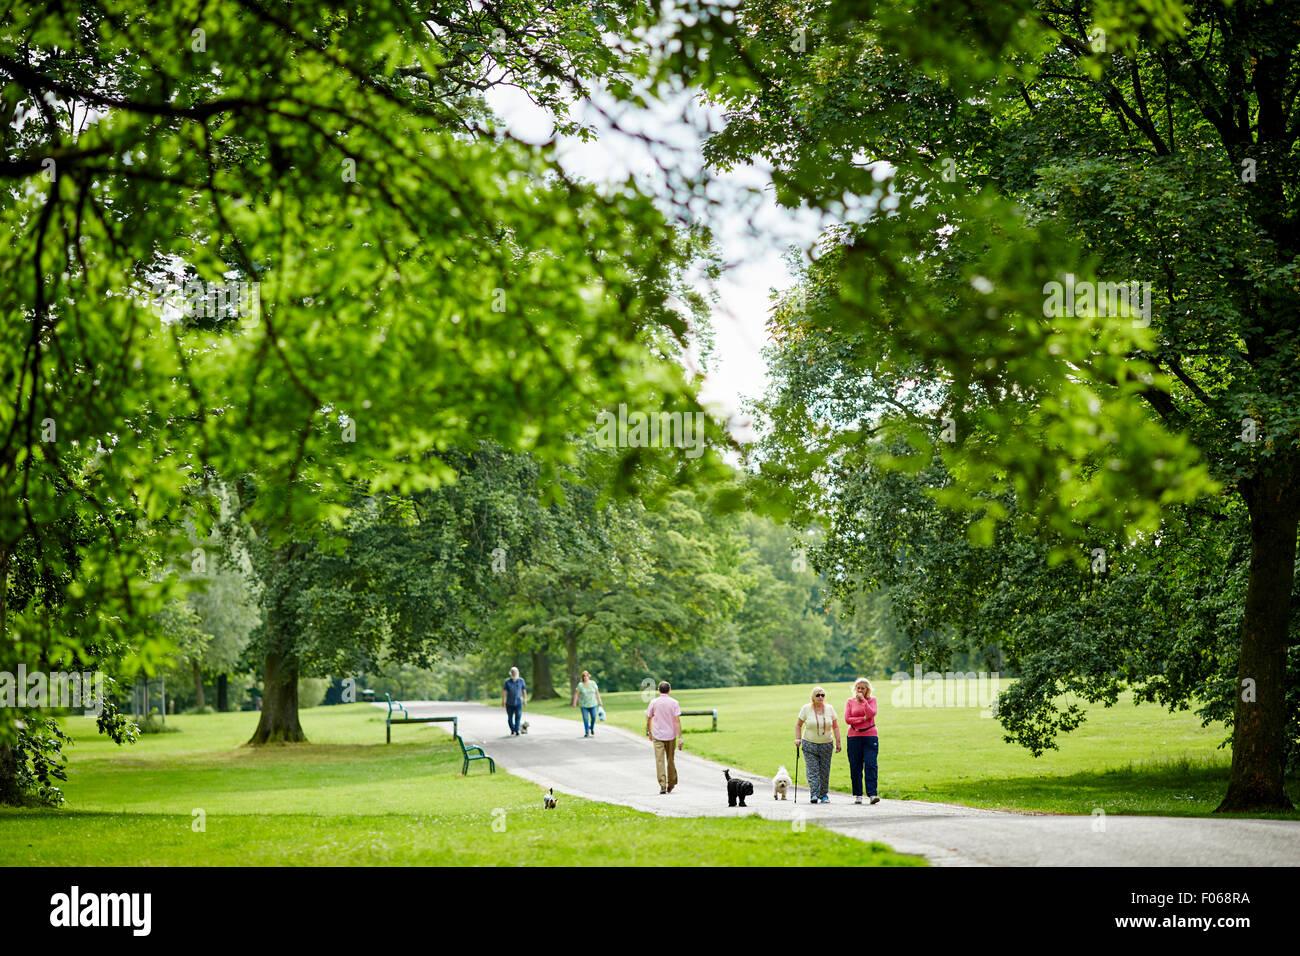 Woodbank memorial park